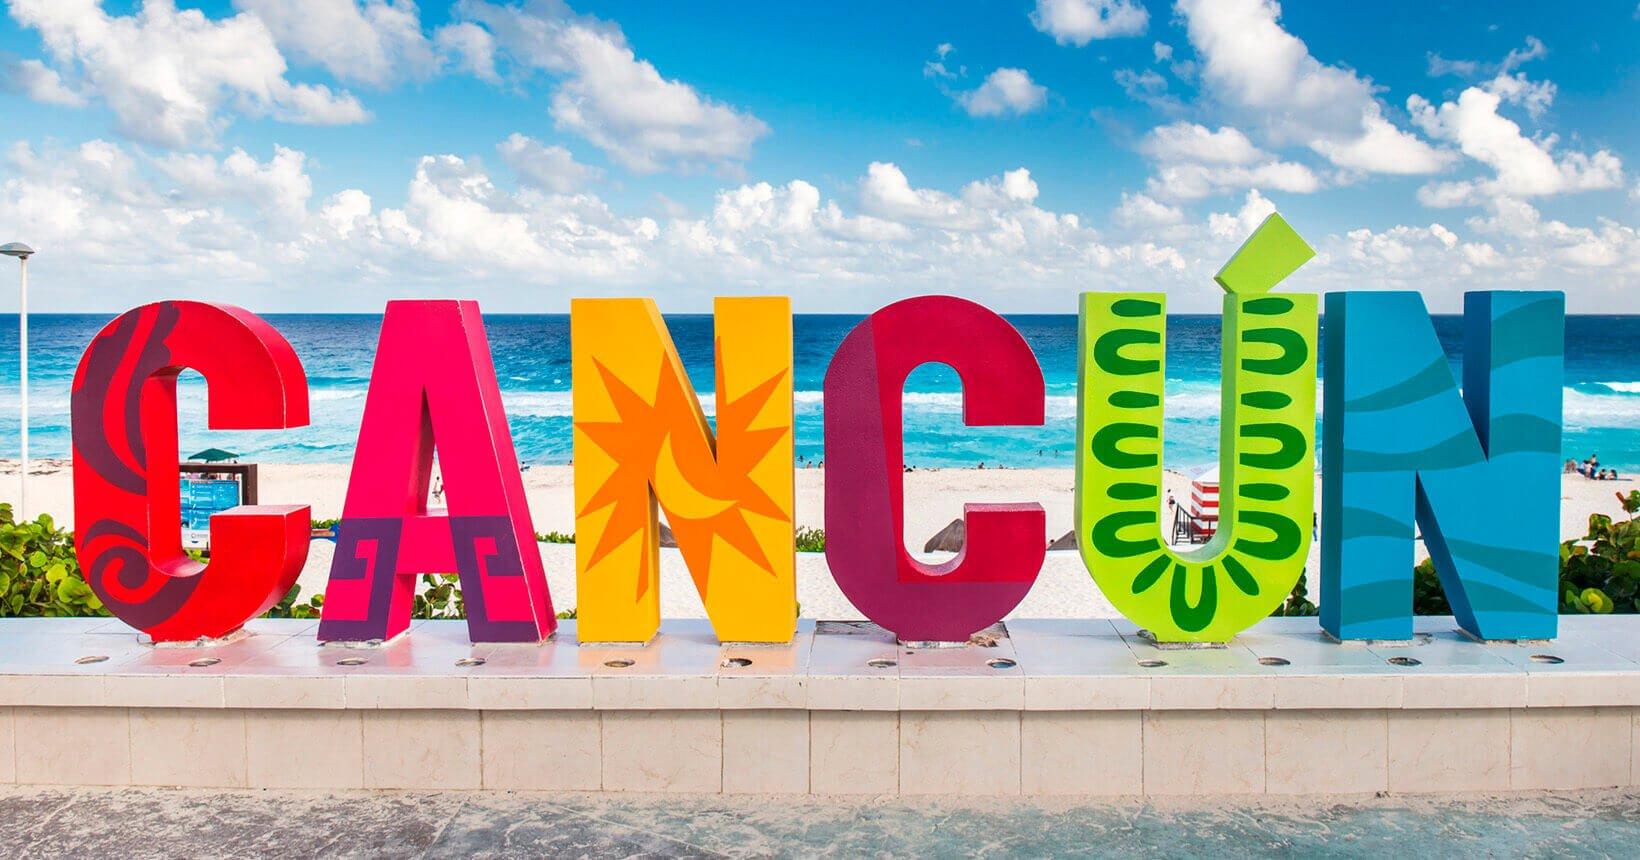 passagens-aereas-cancun-capa2019-01